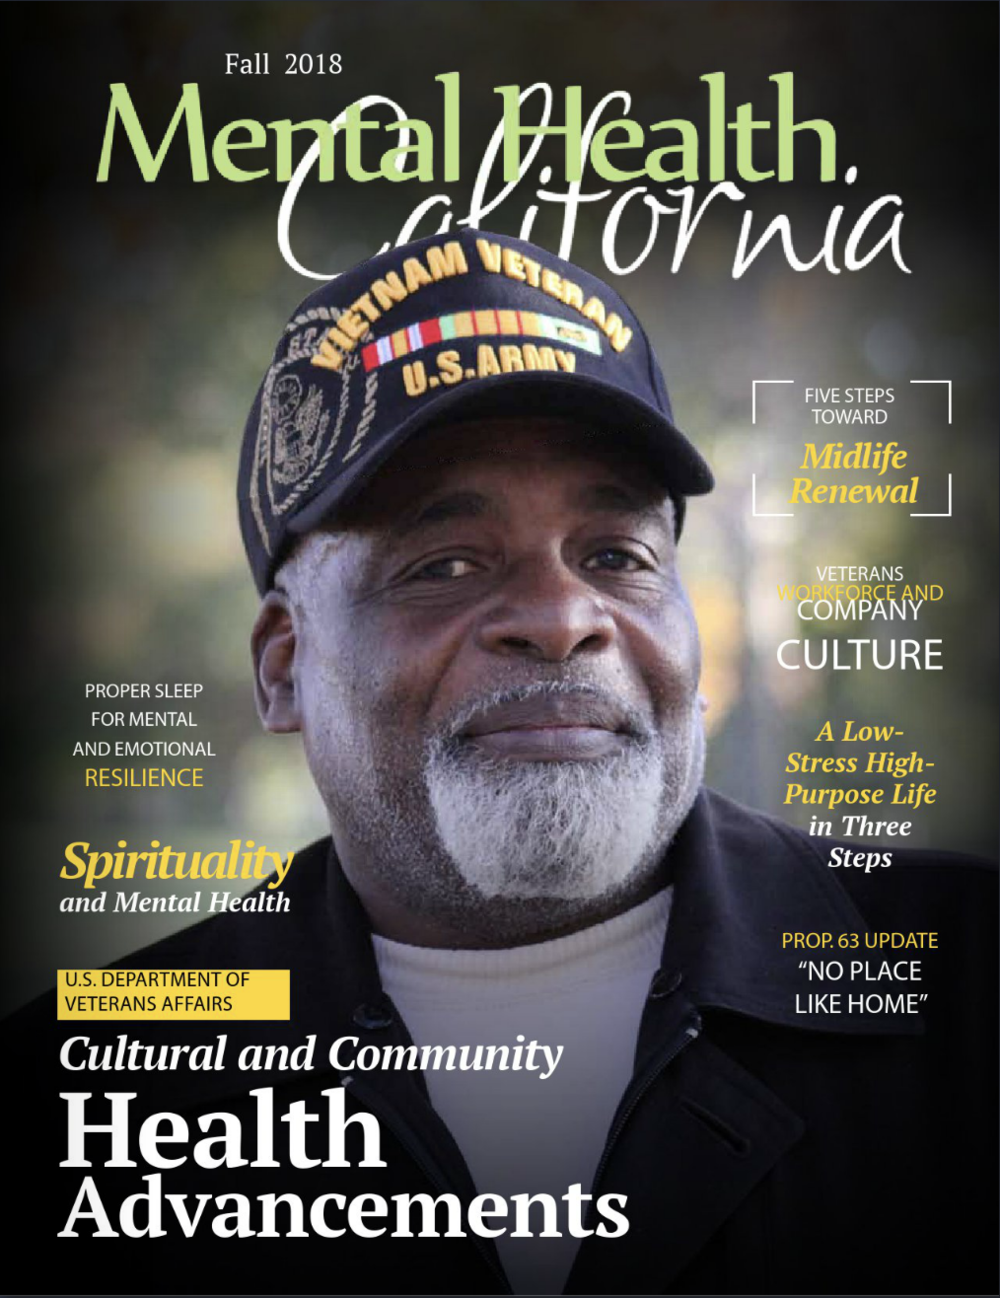 Fall 2018 Issue Of Mental Health California Magazine